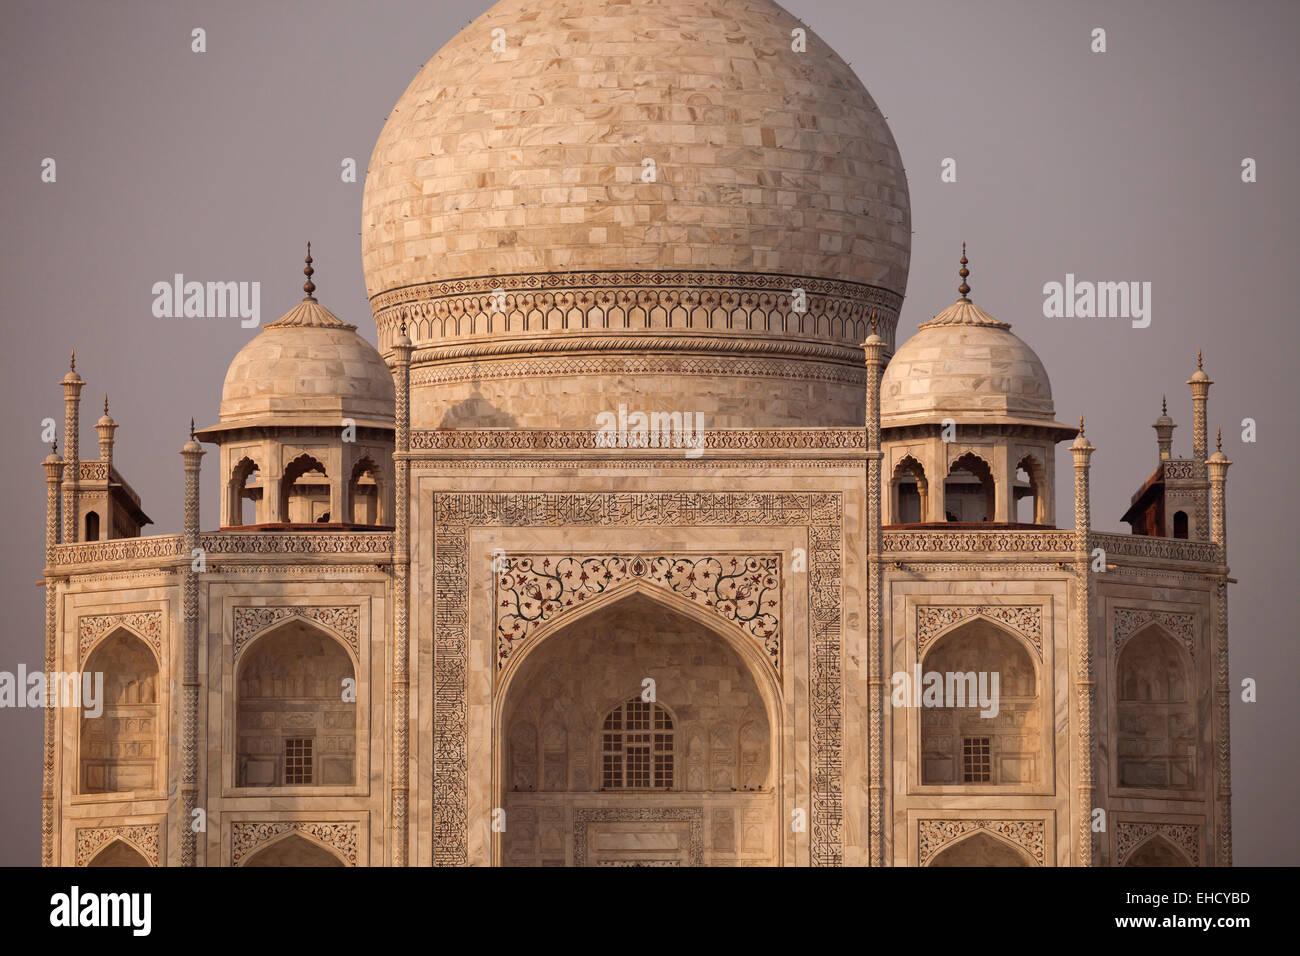 Taj Mahal in Agra, Uttar Pradesh, Indien, Asien |  Taj Mahal in Agra, Uttar Pradesh, Indien, Asien Stockbild